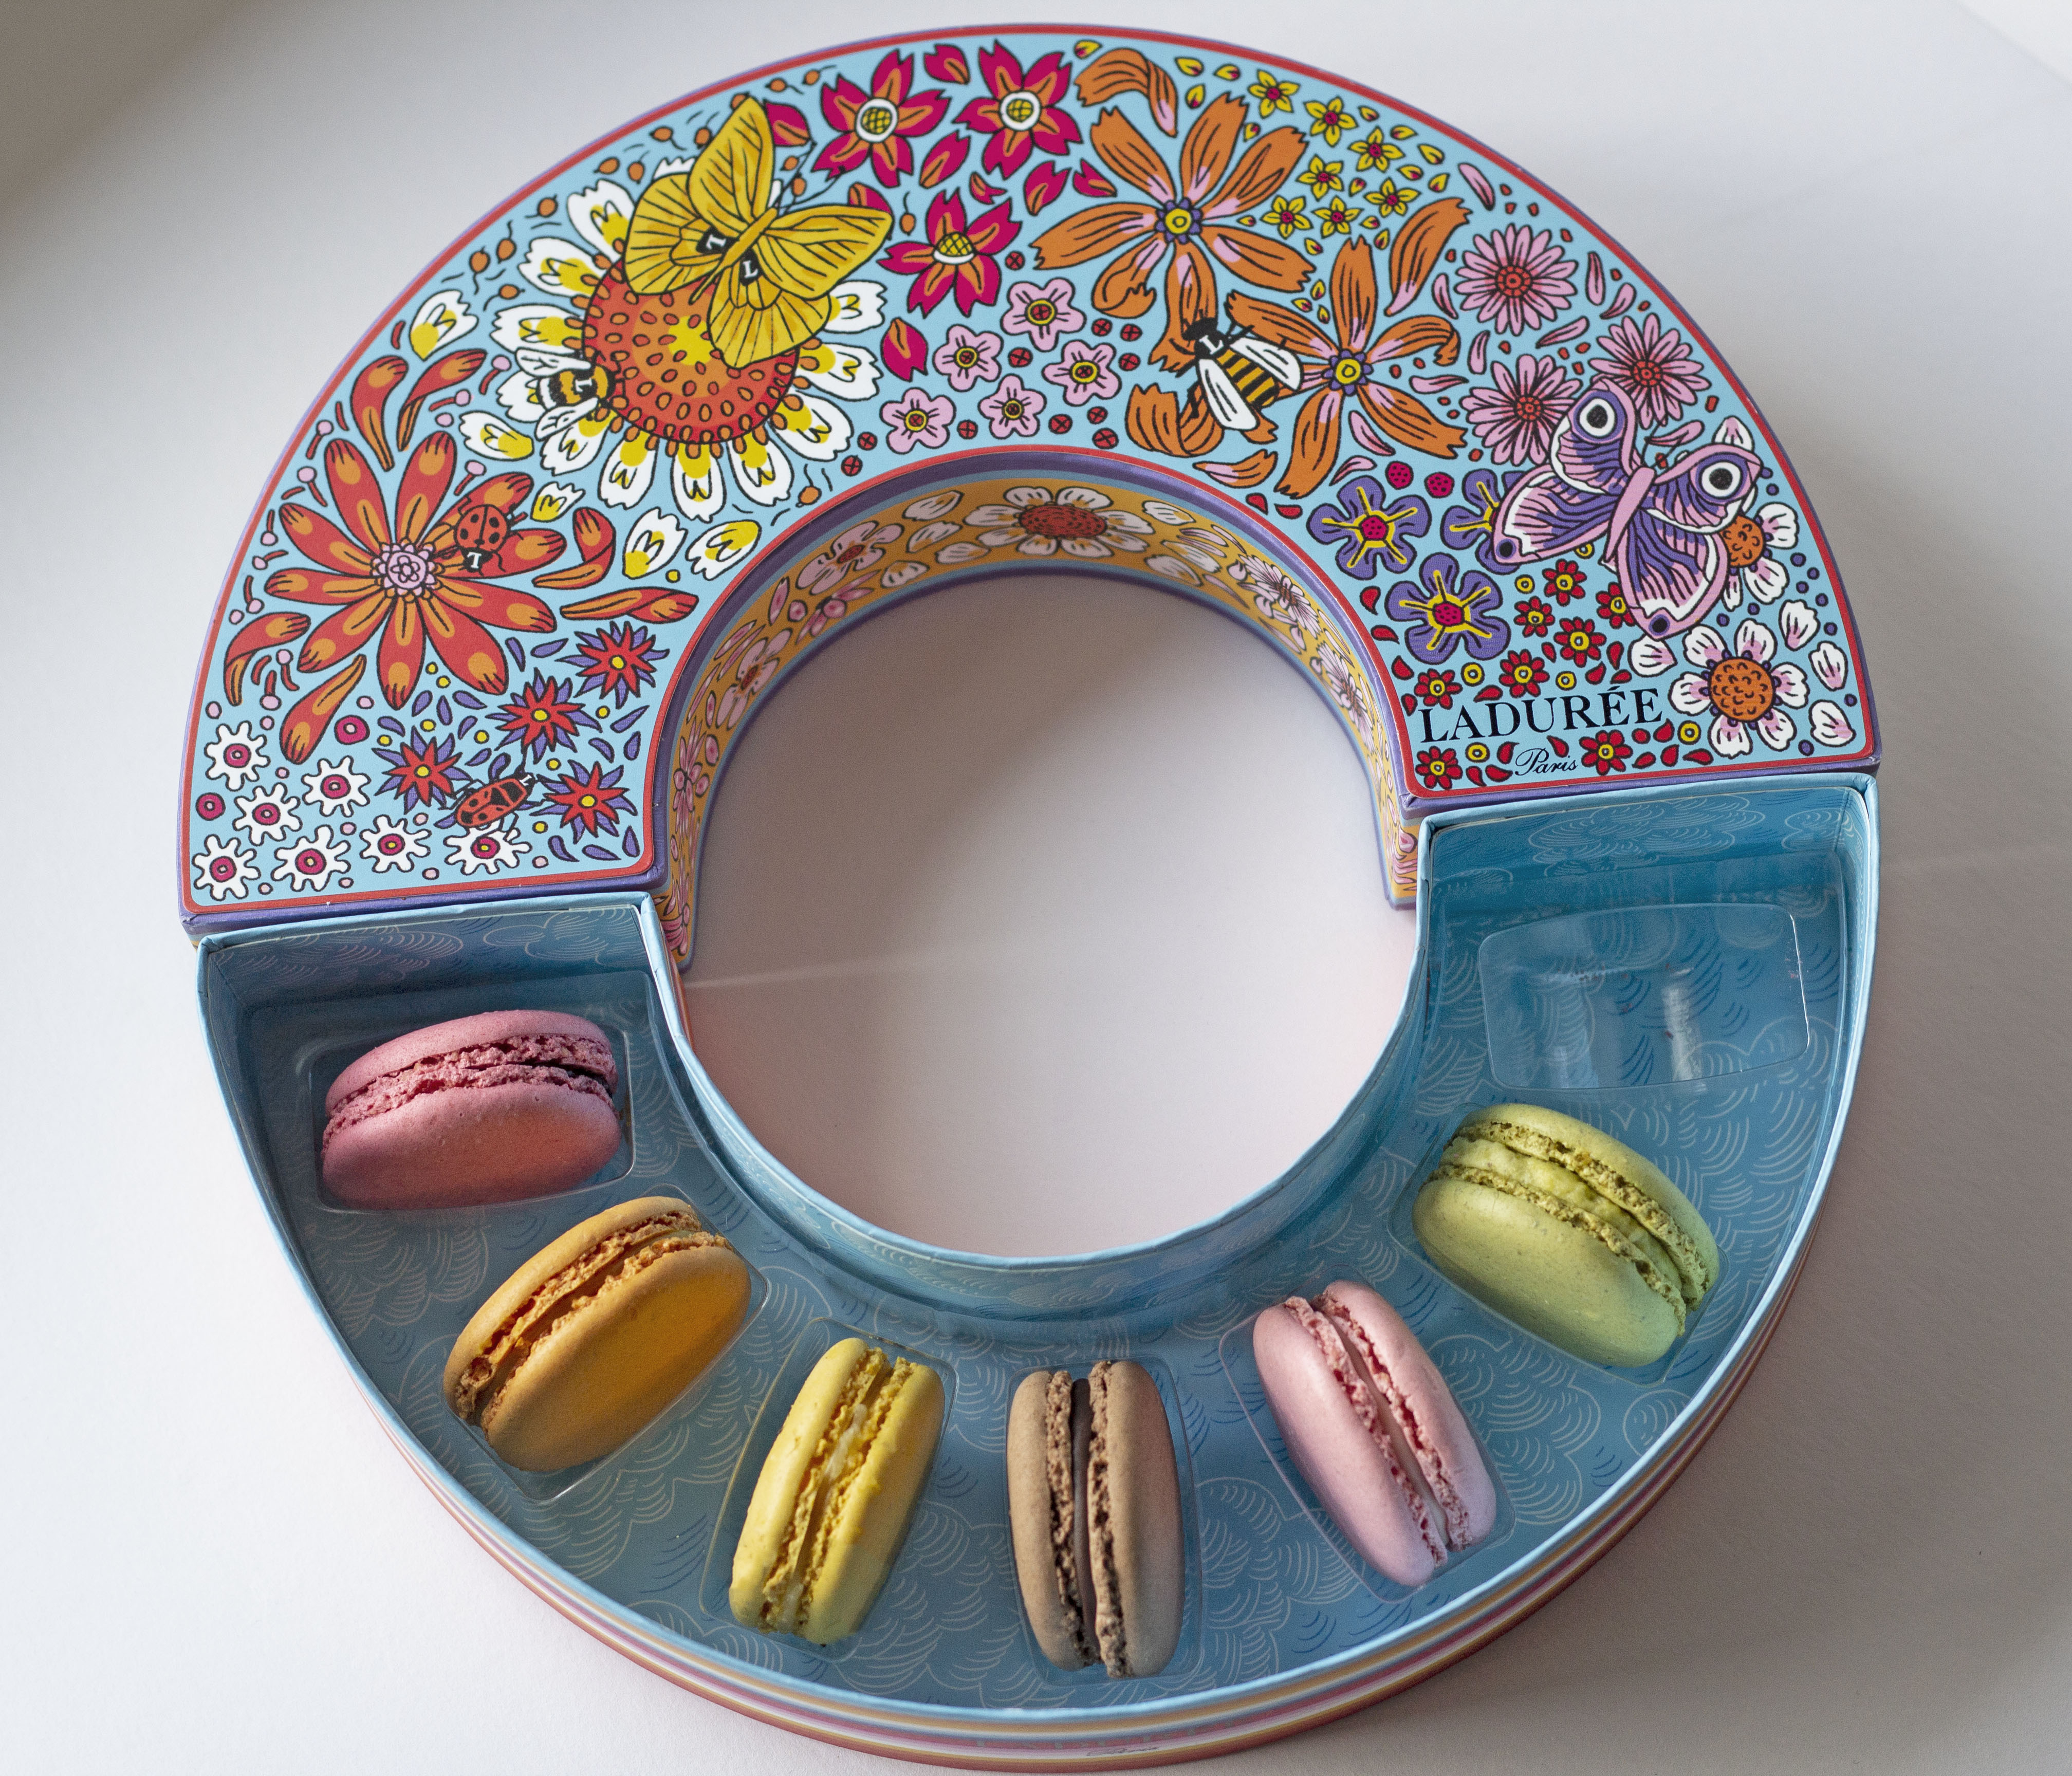 Missing Paris: Ladureé's To-Go Macarons London